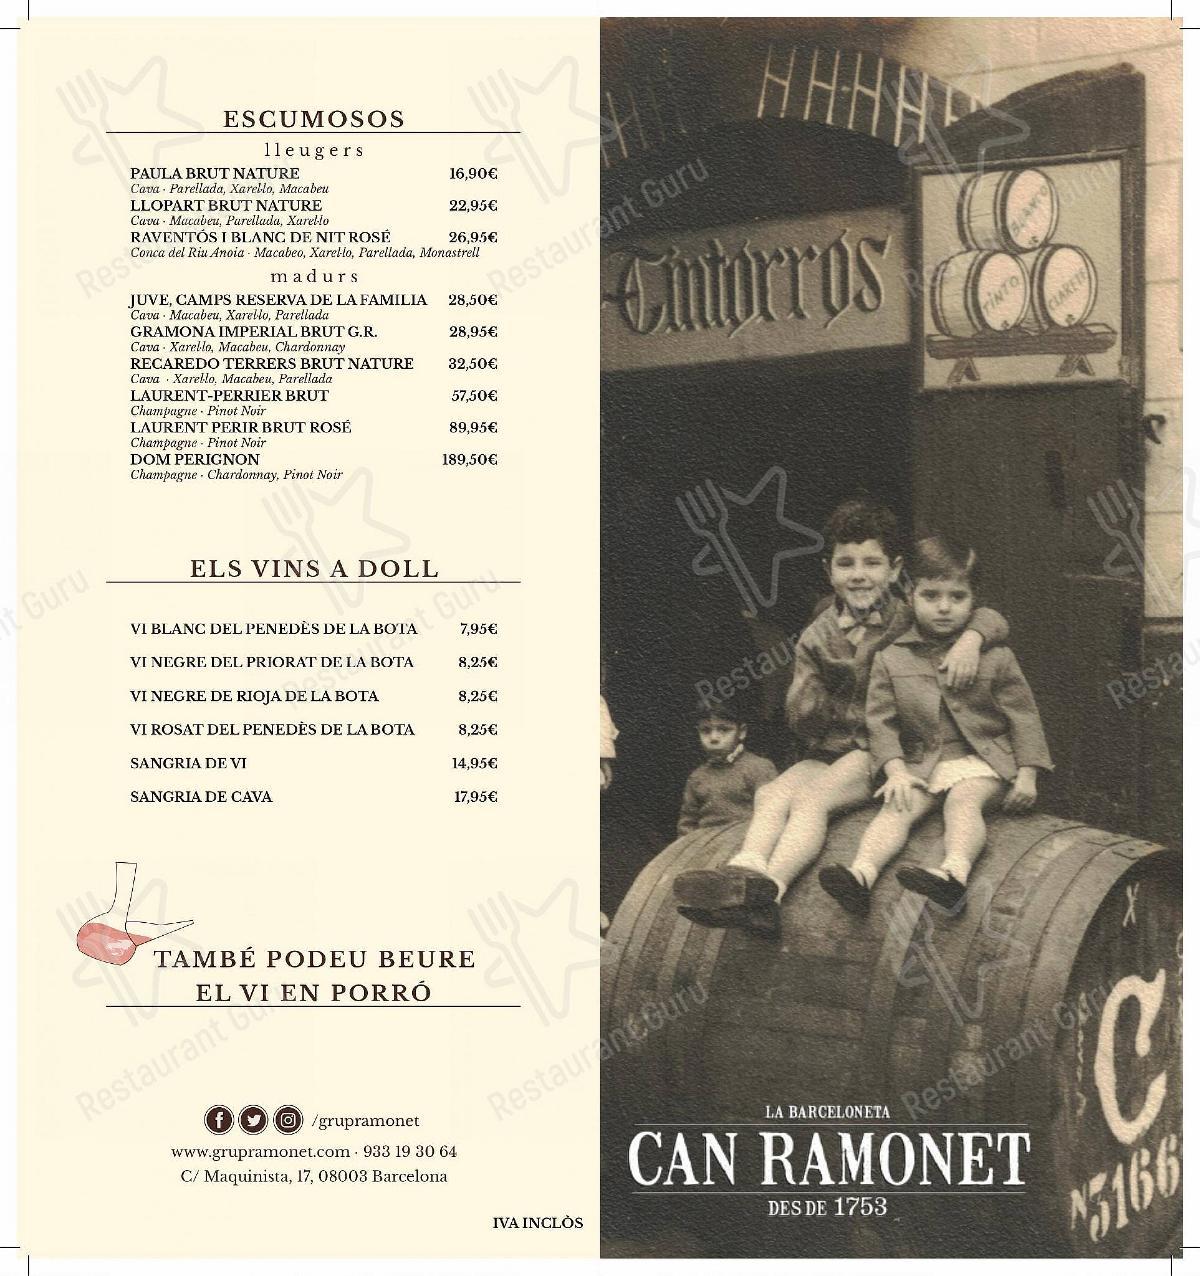 Mira la carta de Can Ramonet